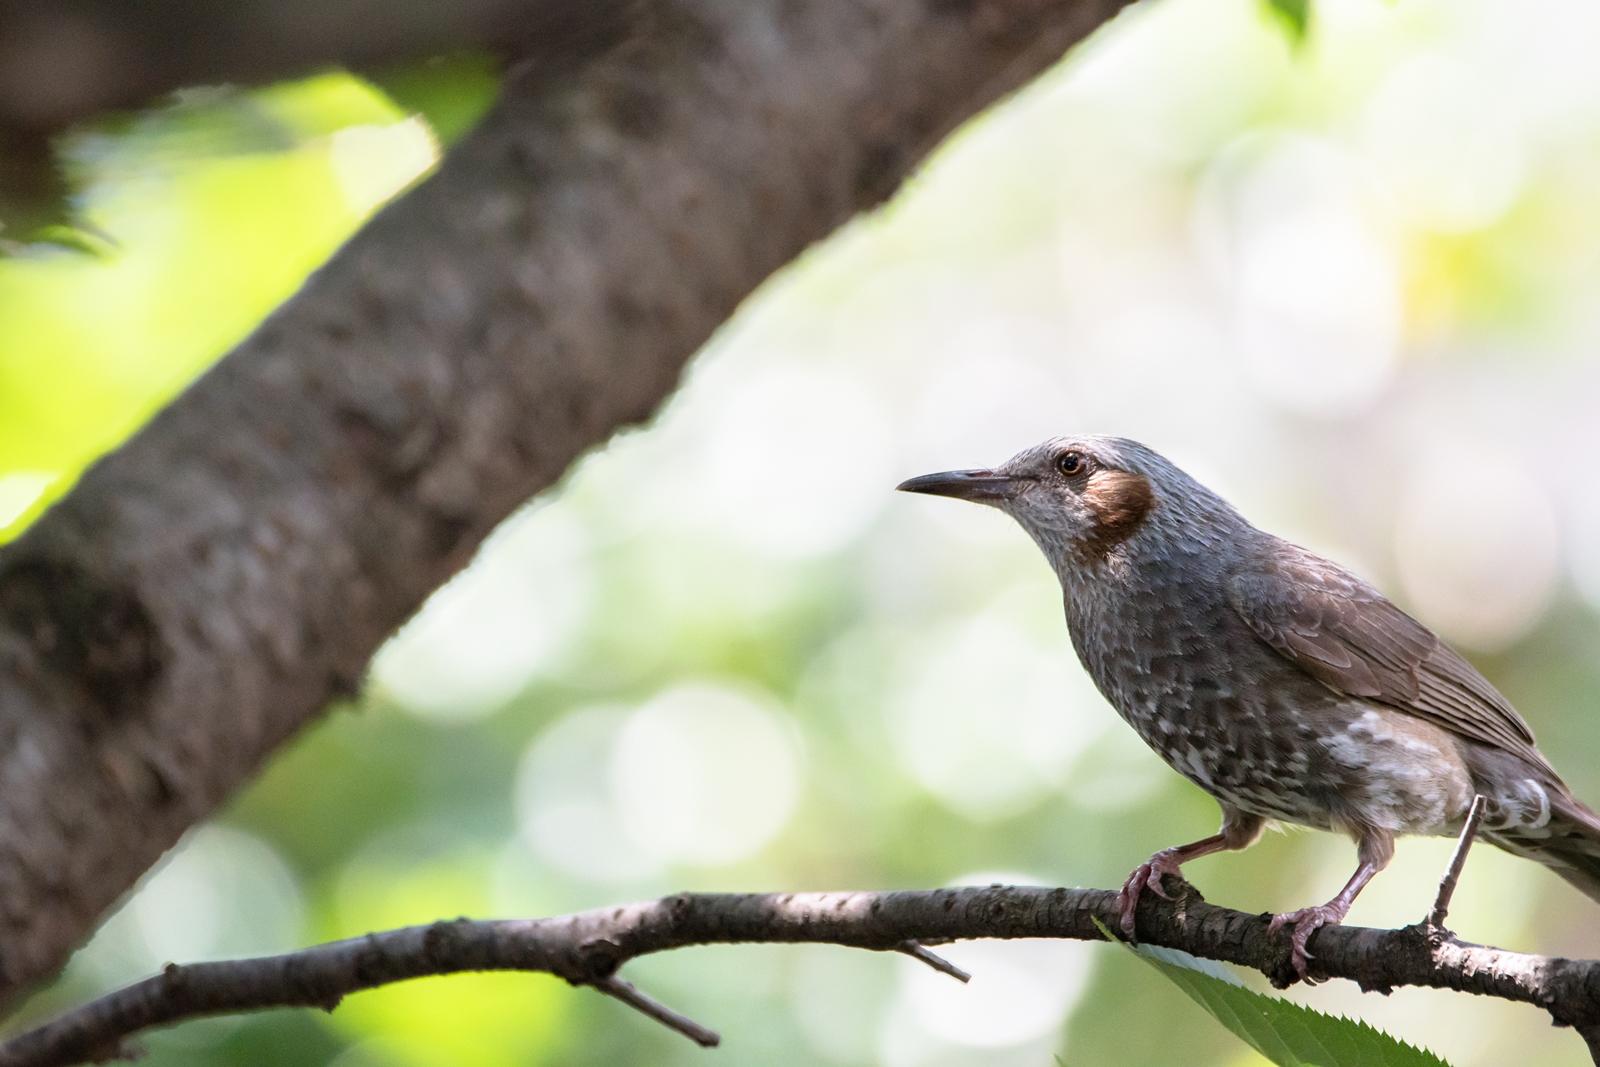 Photo: 「命みなぎる輝き」 / Radiance of green life force.  力強い光 木々や葉が精一杯に輝く ぼくらを包む緑が 命の光を溢れさす  Brown-eared Bulbul. (ヒヨドリ)  Nikon D500 SIGMA 150-600mm F5-6.3 DG OS HSM Contemporary  #birdphotography #birds #kawaii #ことり #小鳥 #nikon #sigma  ( http://takafumiooshio.com/archives/2762 )